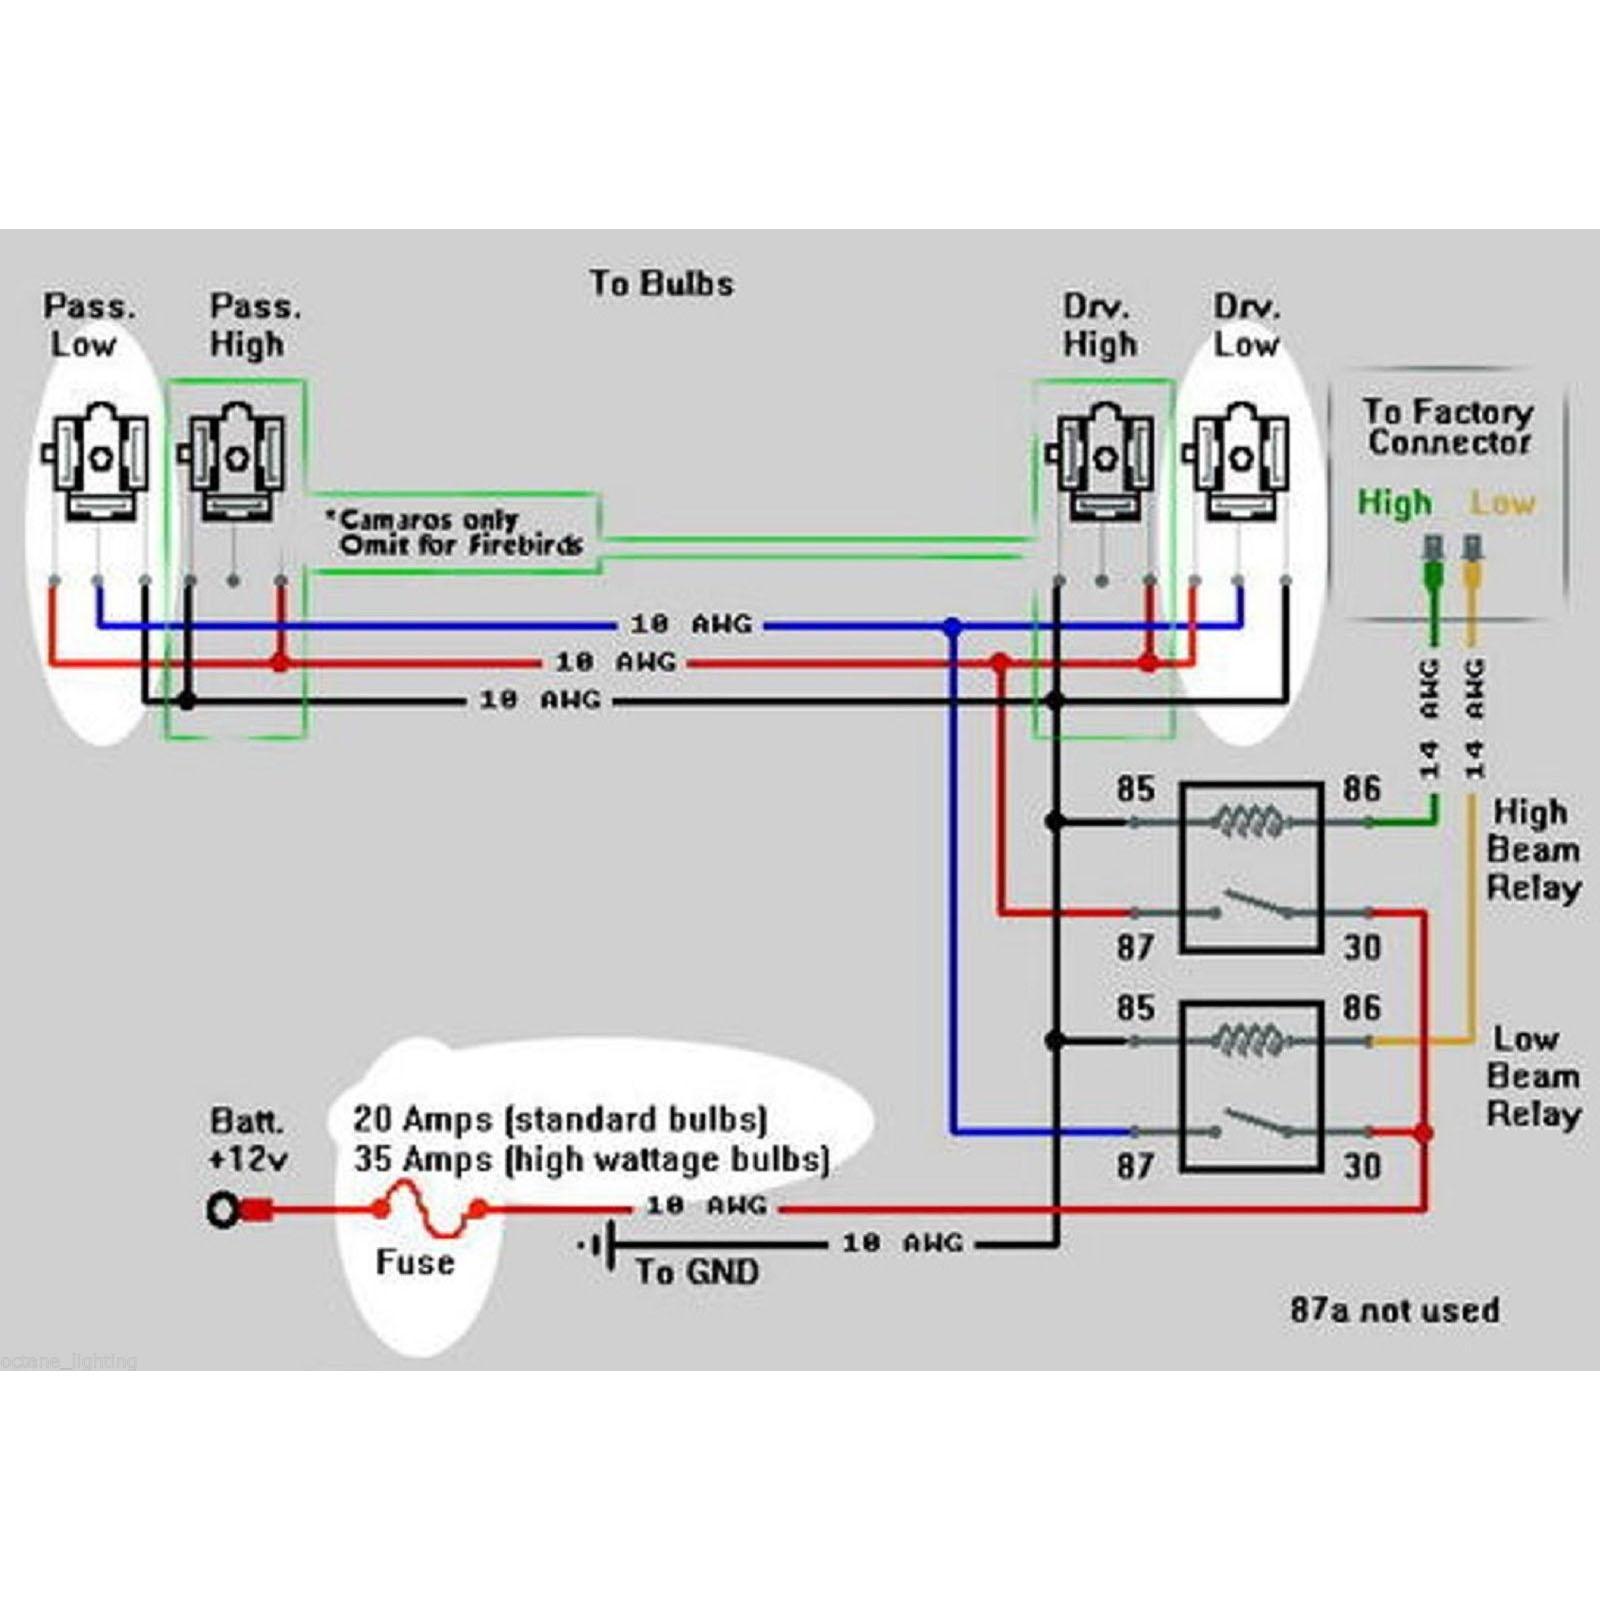 G9 Wiring Harness - Wiring Diagram M4 on